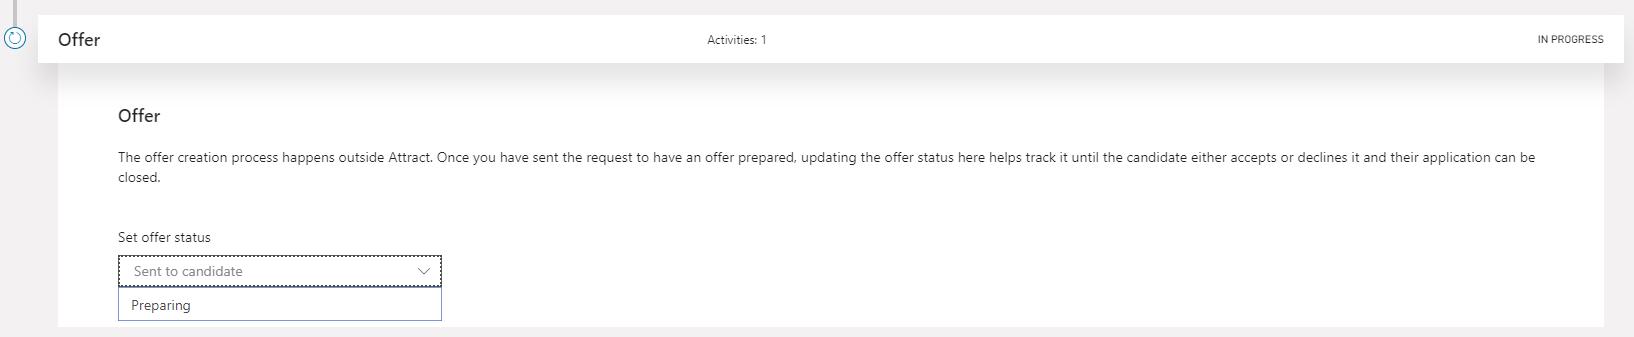 Offer settings preparing